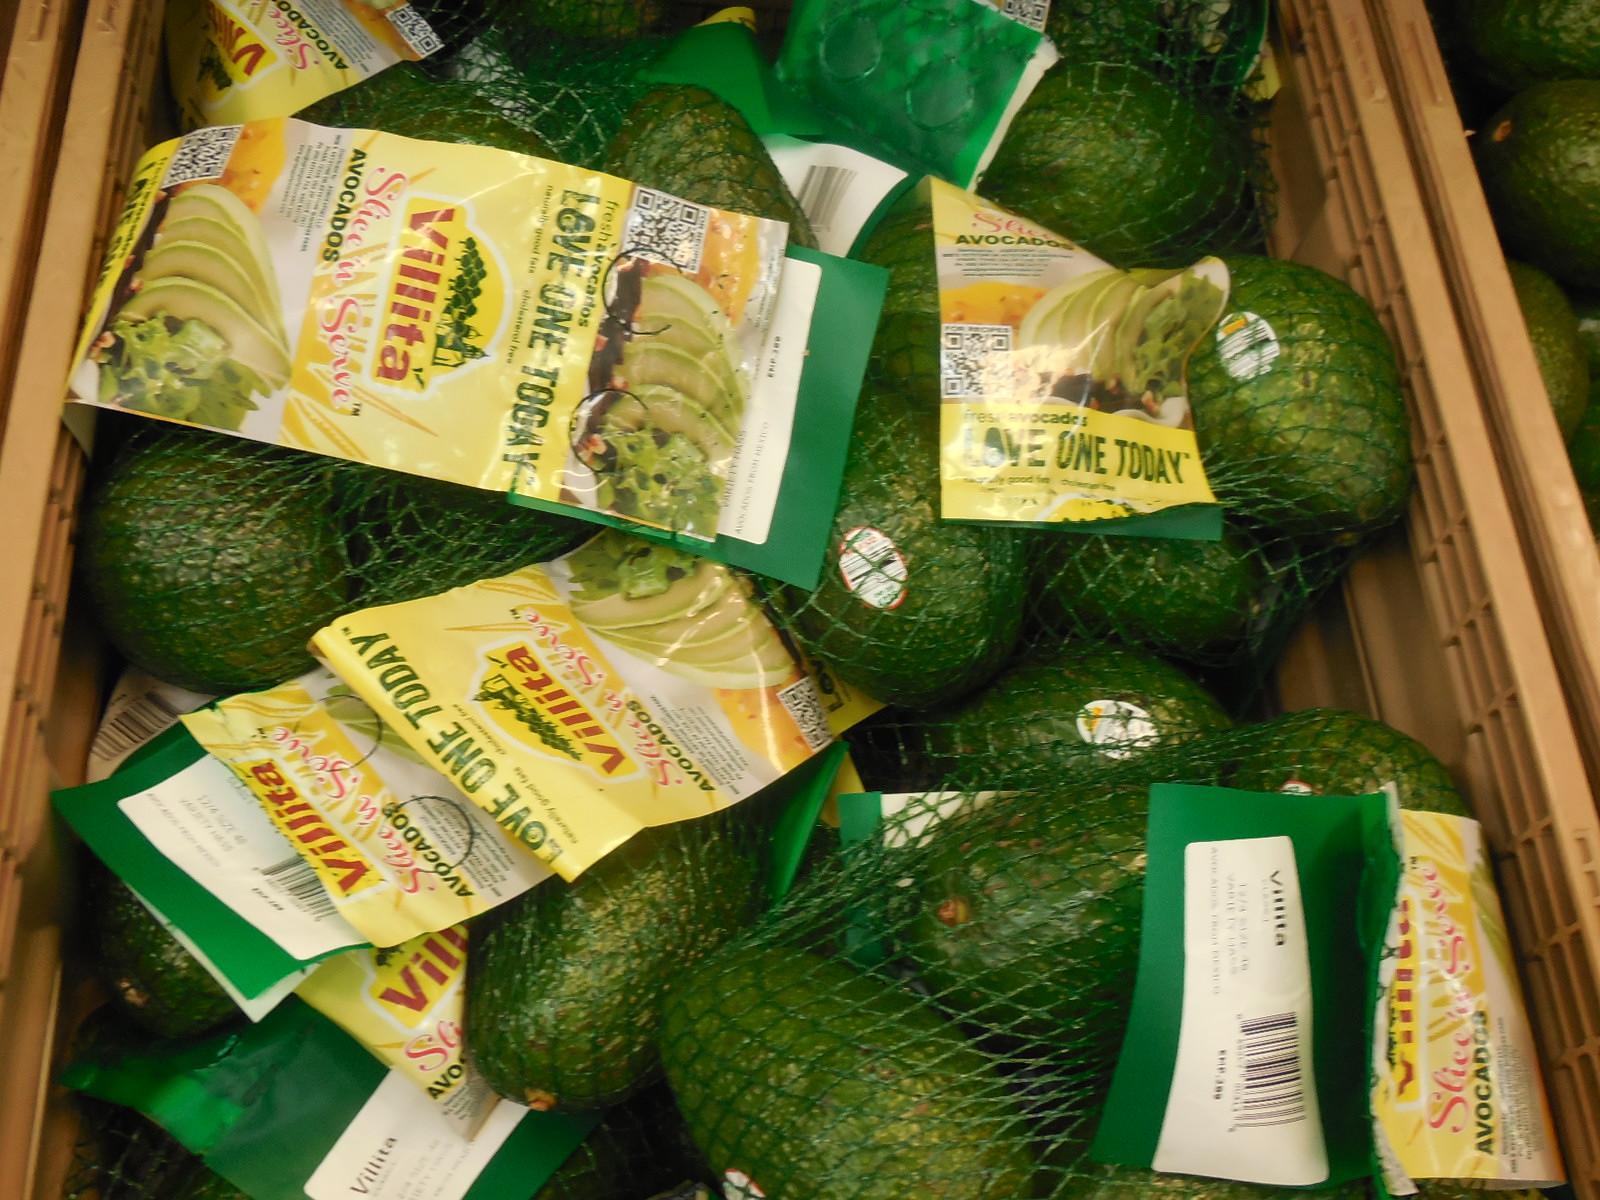 500 Million Avocados Sold At Retail During 2016 Avocado